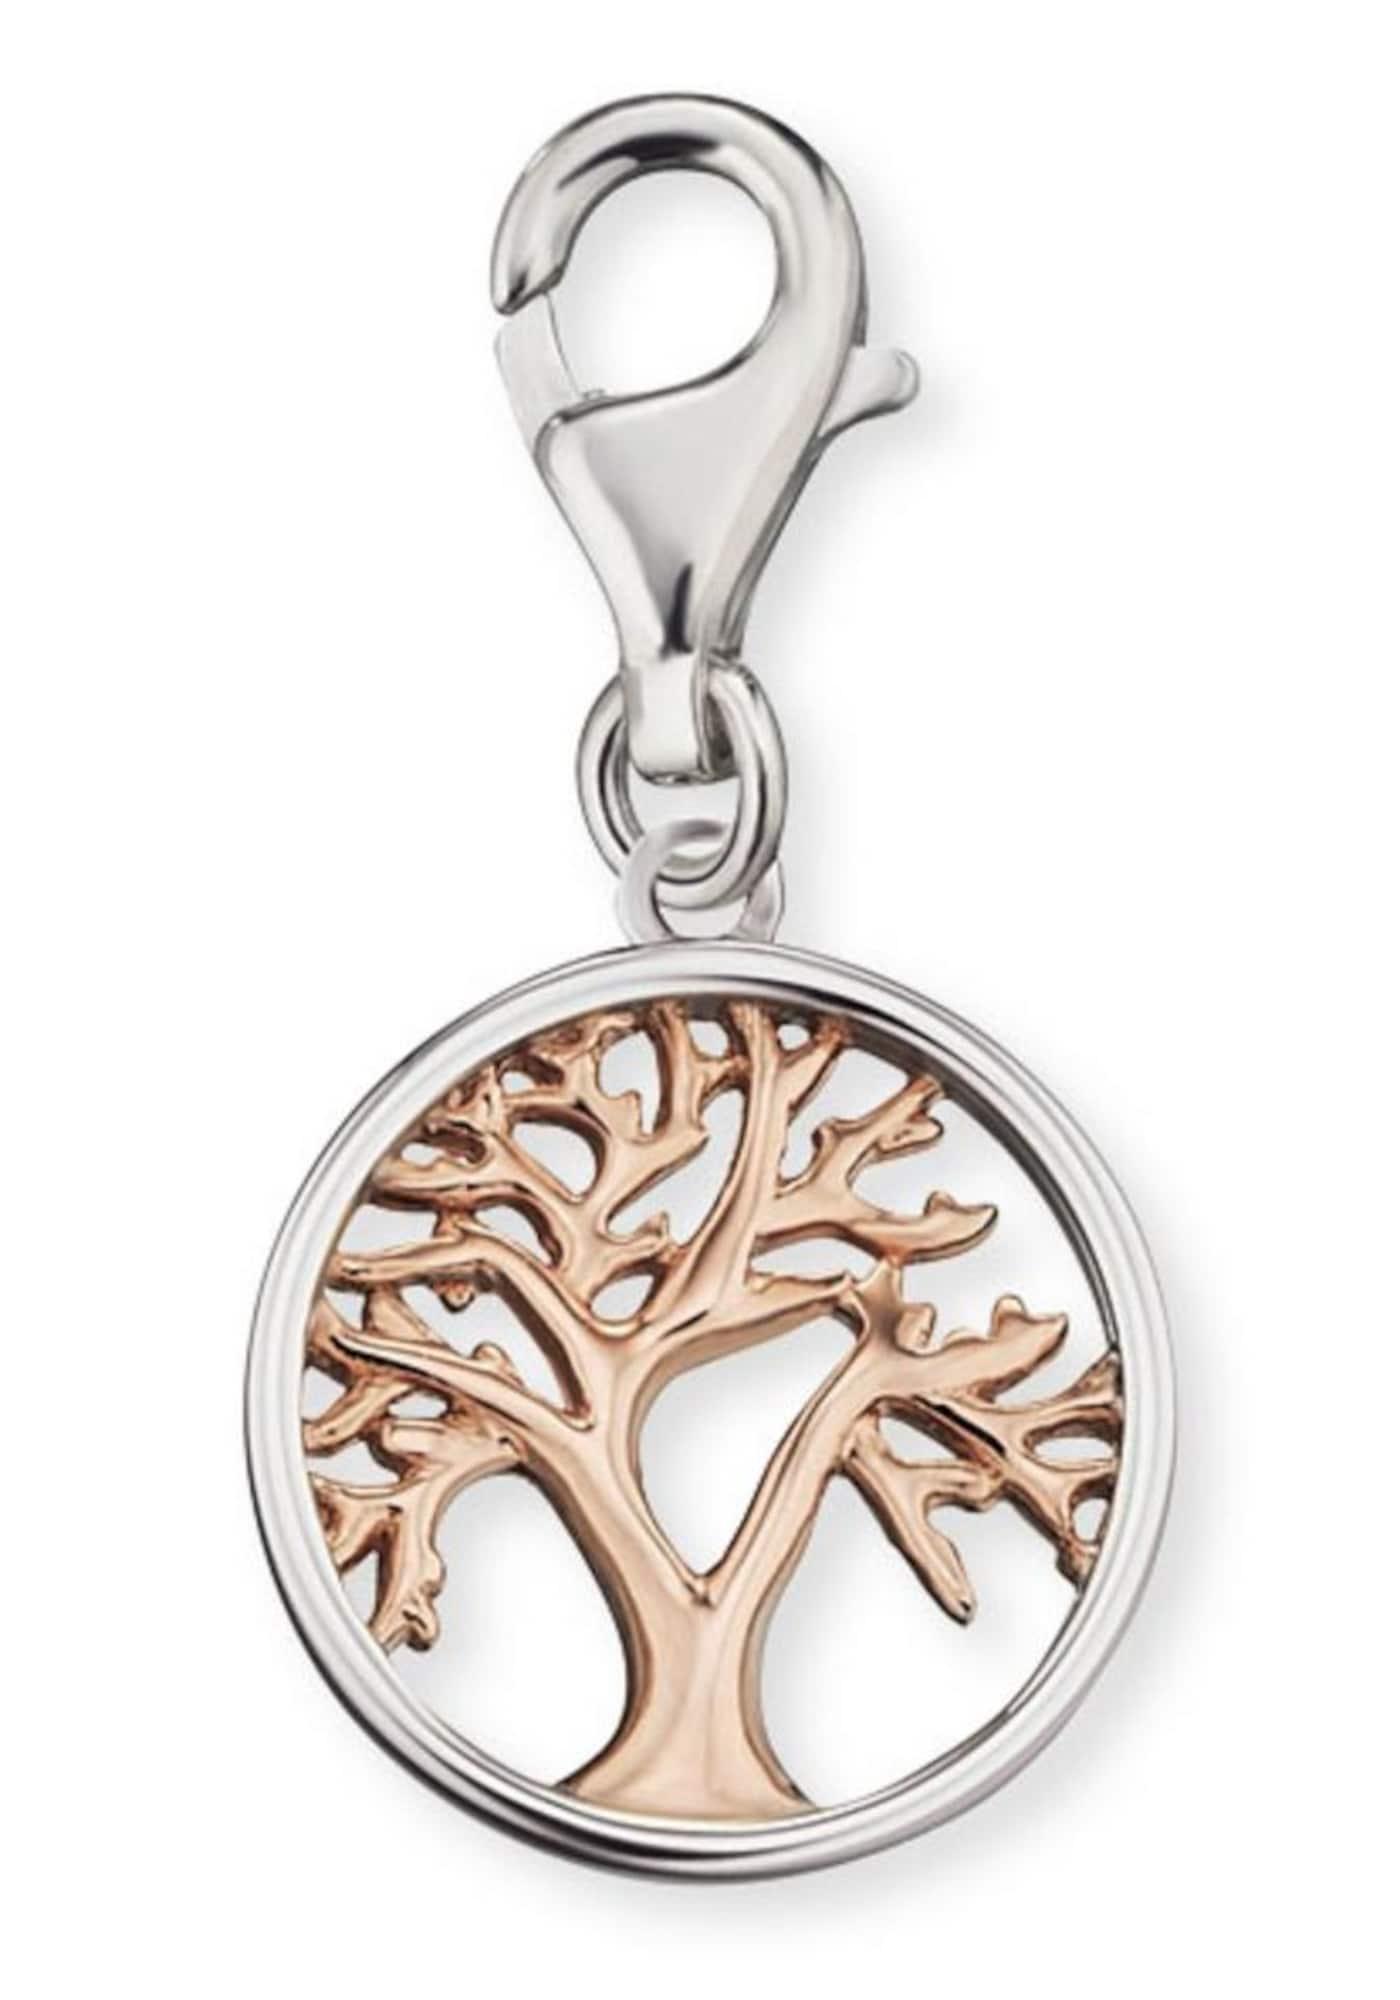 Charm-Einhänger 'Lebensbaum' | Schmuck > Charms > Charms Anhänger | Engelsrufer